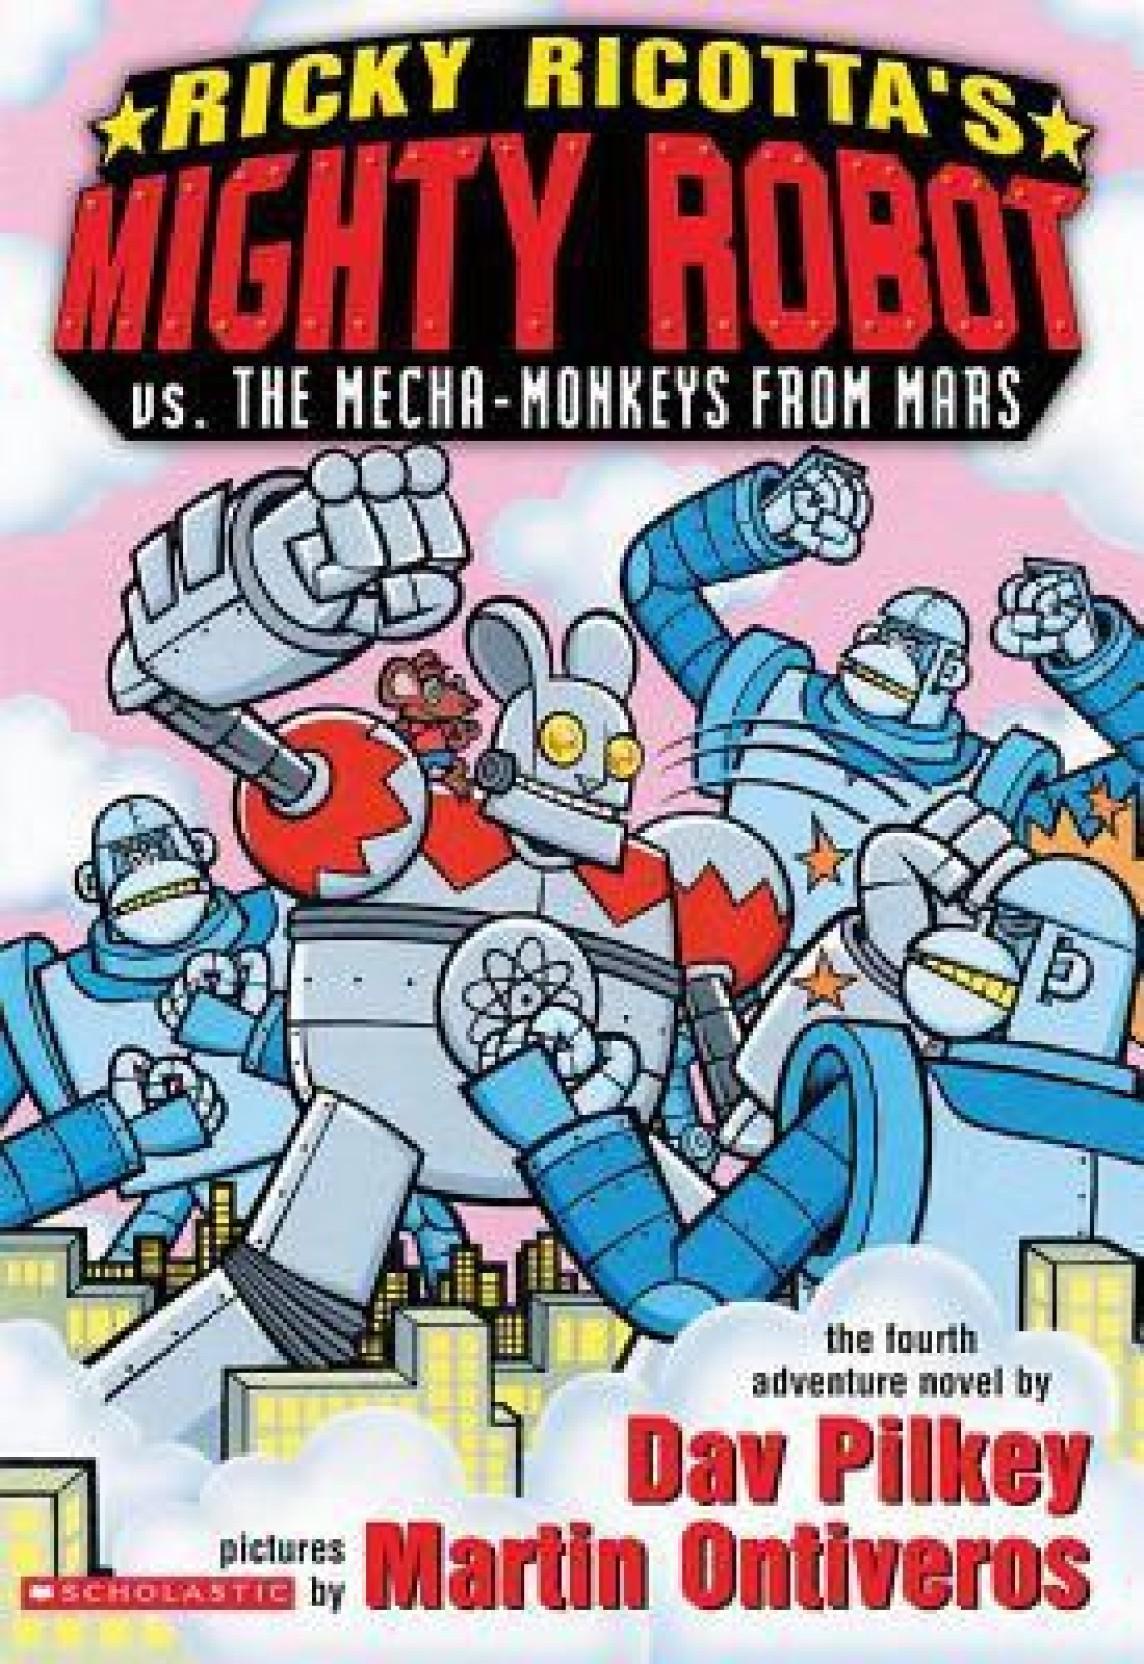 Ricky Ricotta's Mighty Robot Vs. the Mecha-monkeys from Mars. ADD TO CART